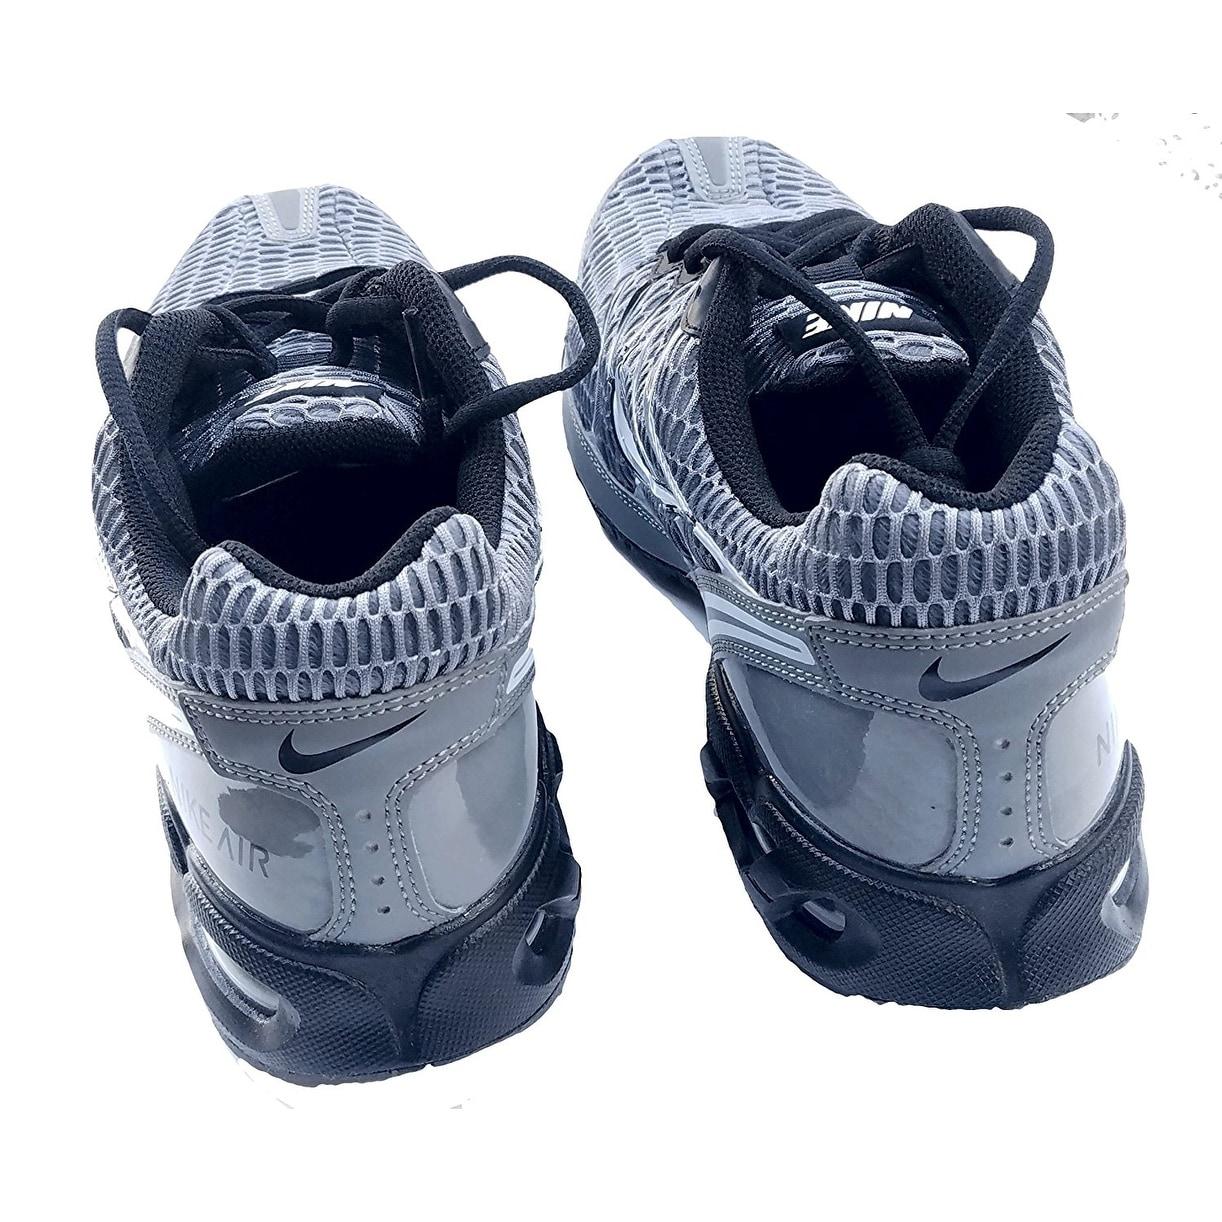 Shop Mens Nike Air Max Torch 4 Running Shoe Cool Grey White Black Tshirt Women Blue Navy M Pure Platinum Free Shipping Today 17941816